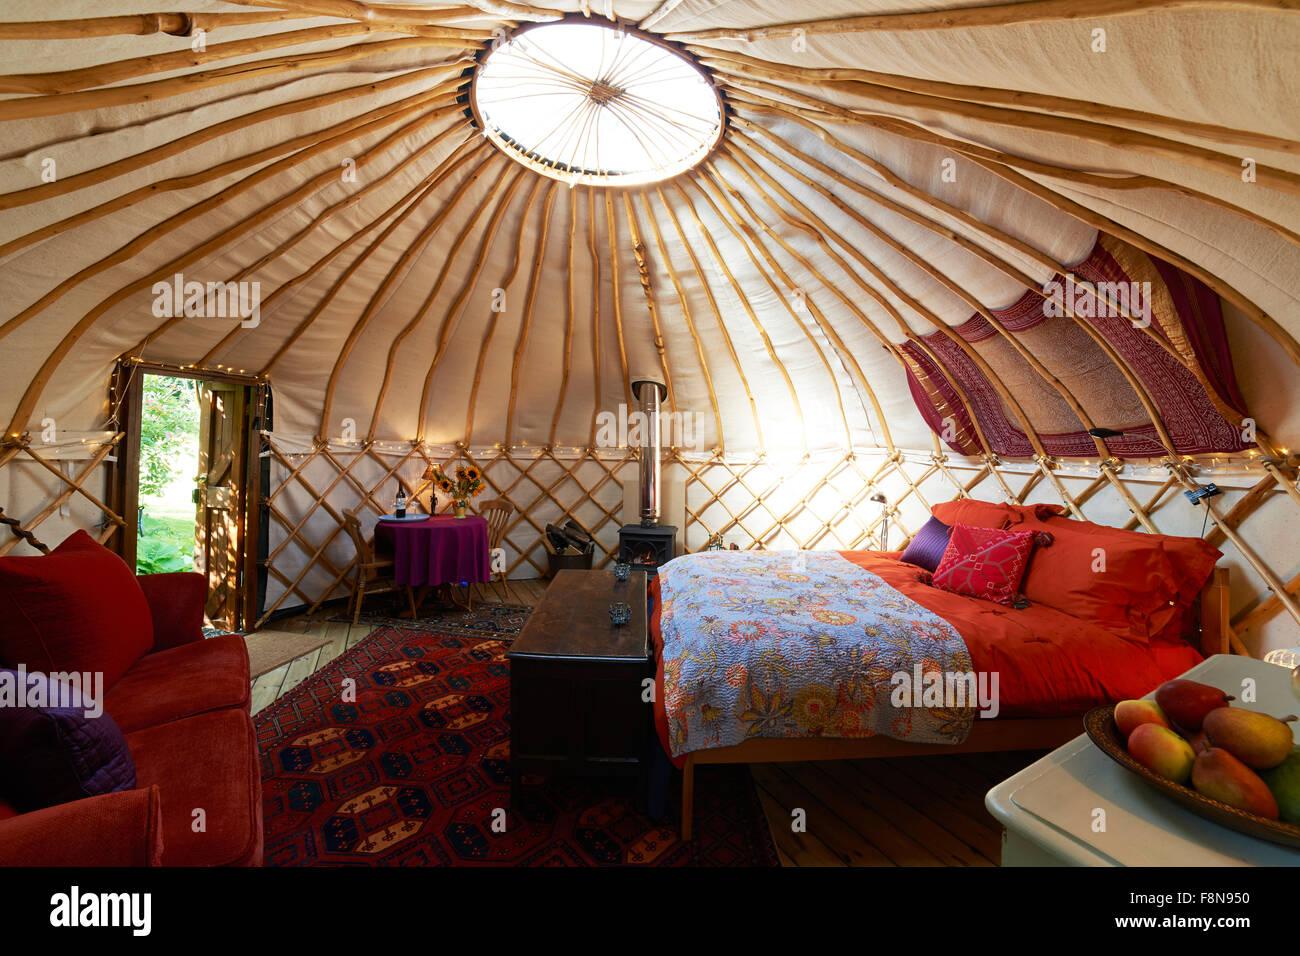 Interior Of Empty Holiday Yurt - Stock Image